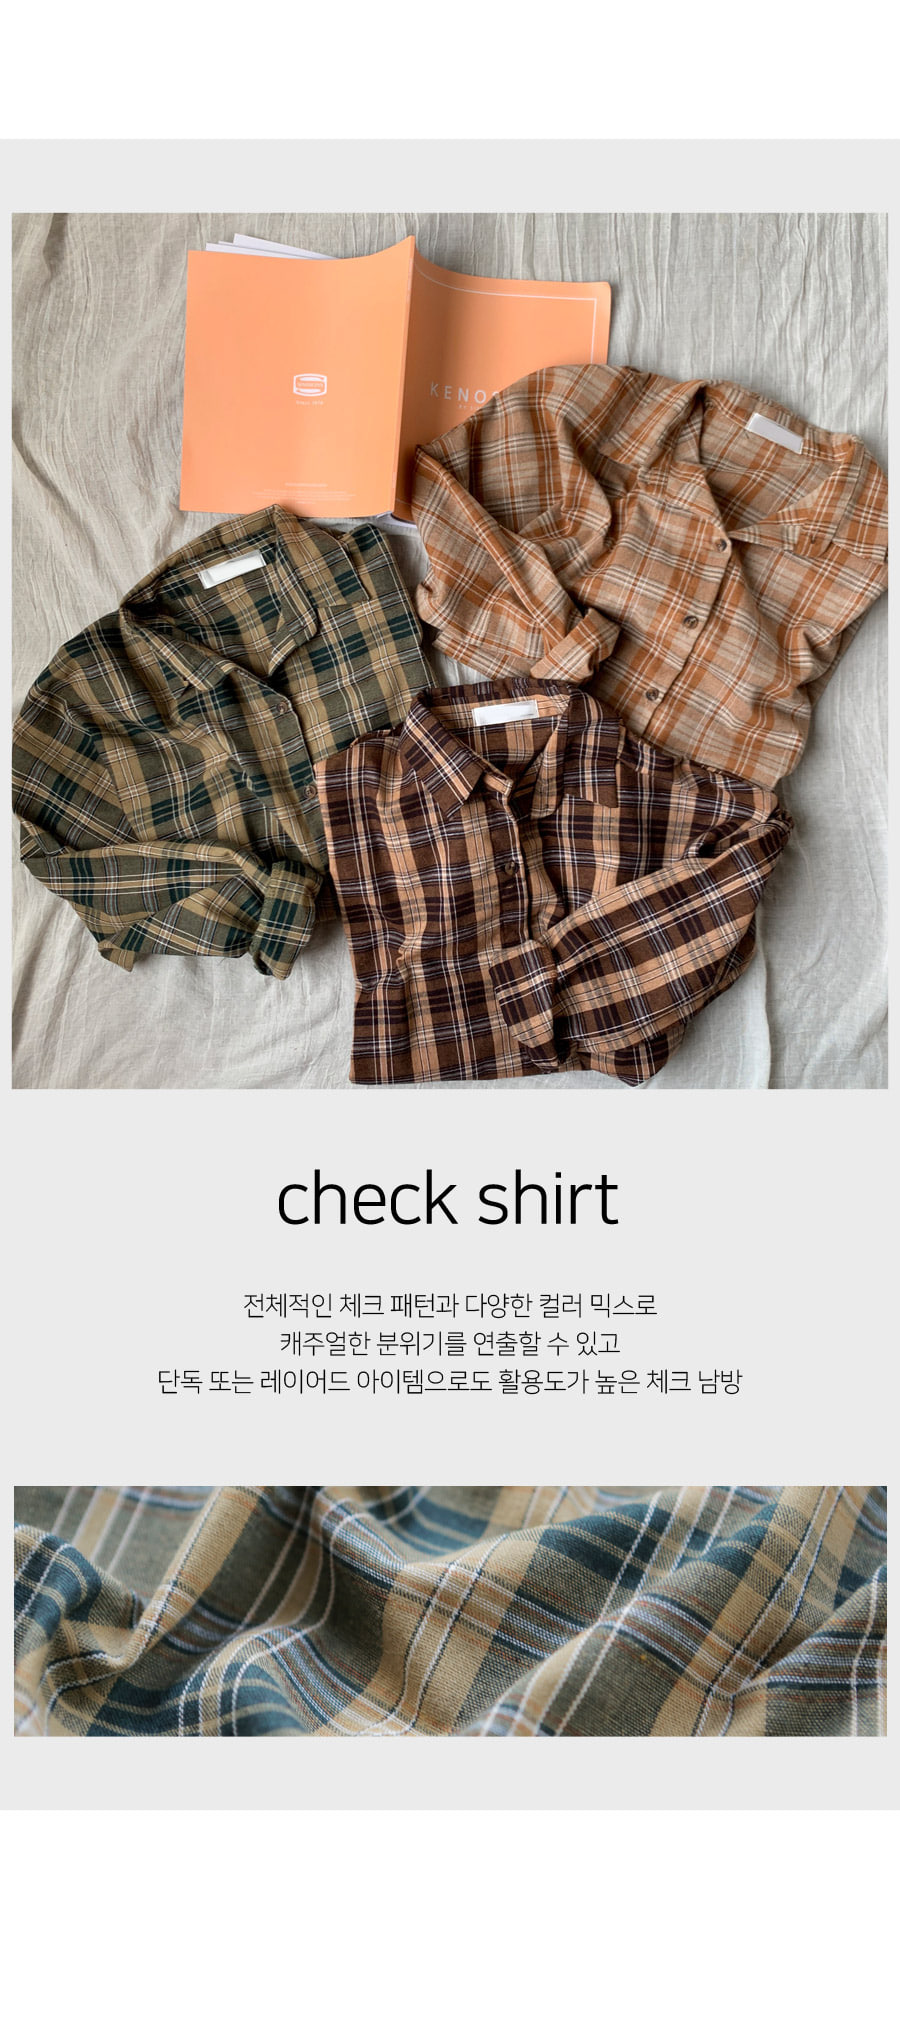 Berlin check shirt